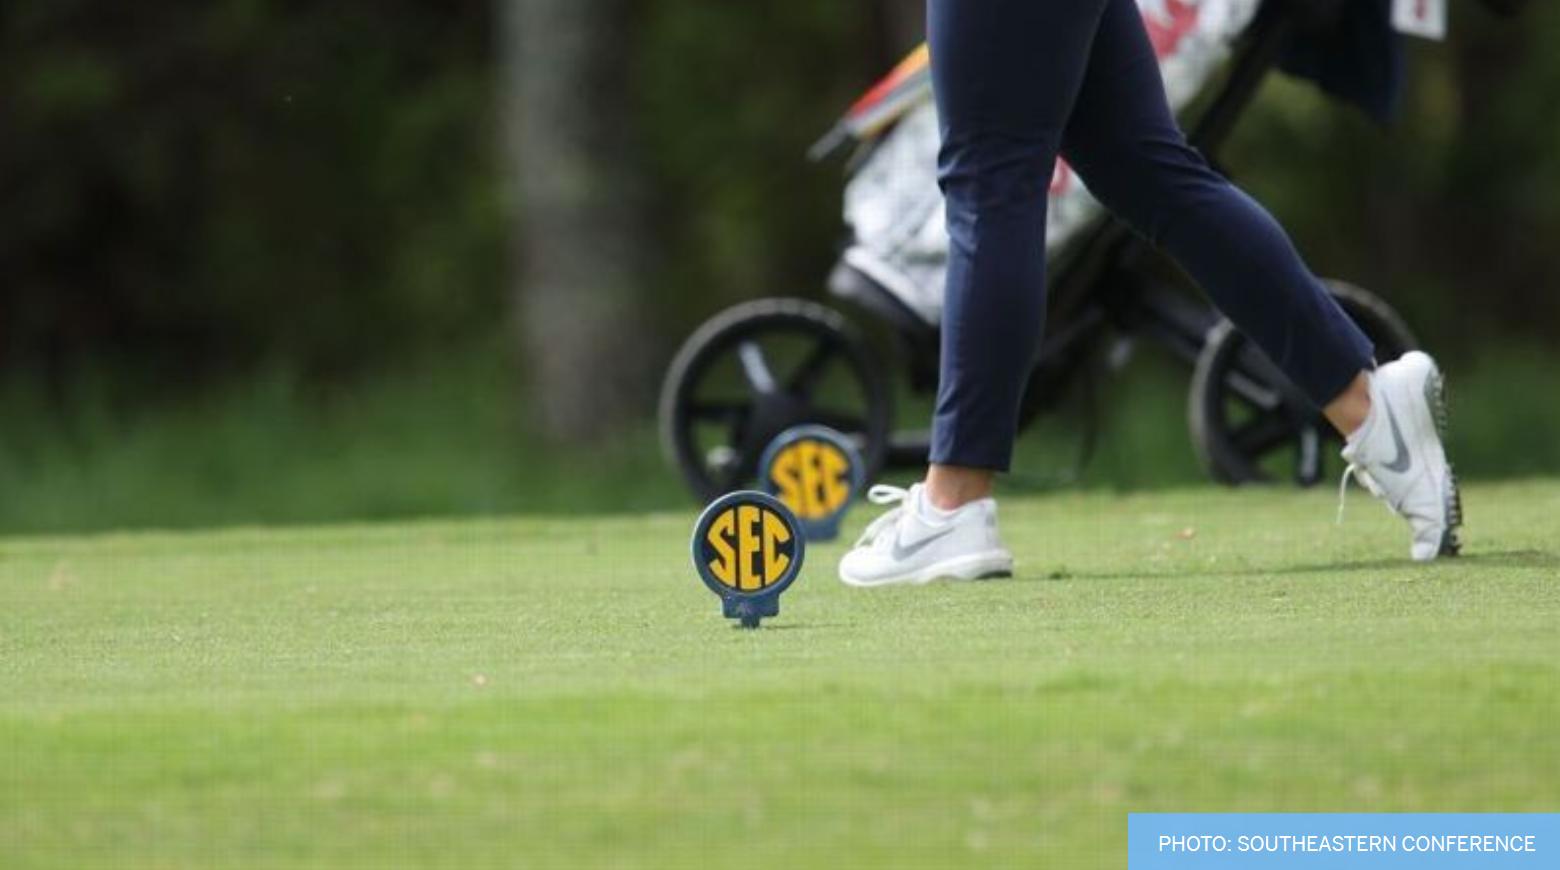 2021 SEC Women's Golf Community Service Team Announced